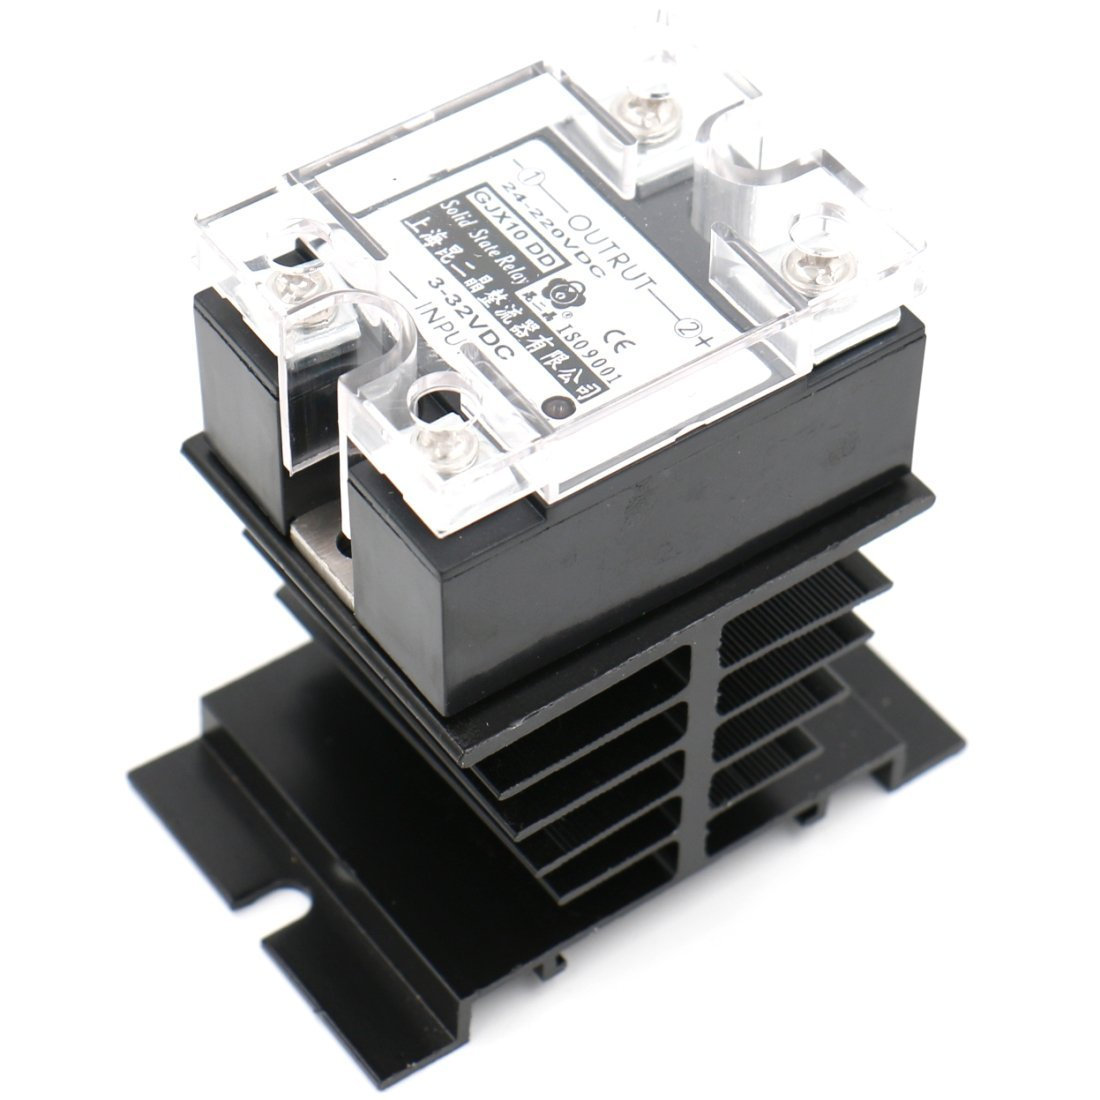 SSR-40DD 40A Signal Phase DC Solid State Relay DC 3-32V DC 24-220V + Heat  Sink | heschen